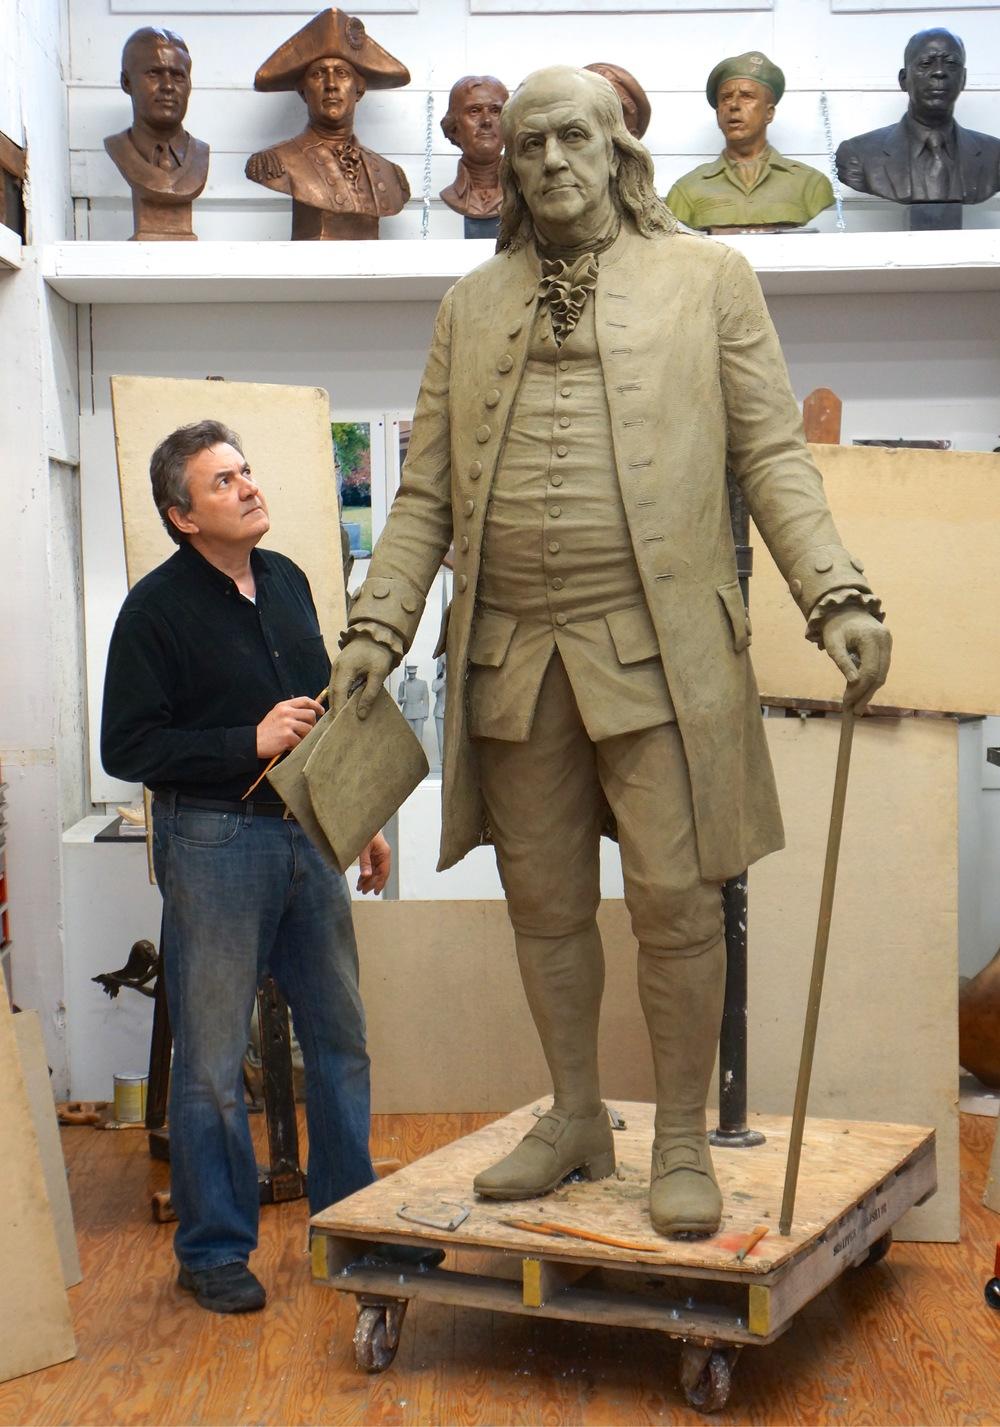 Benjamin Franklin, portrait statue